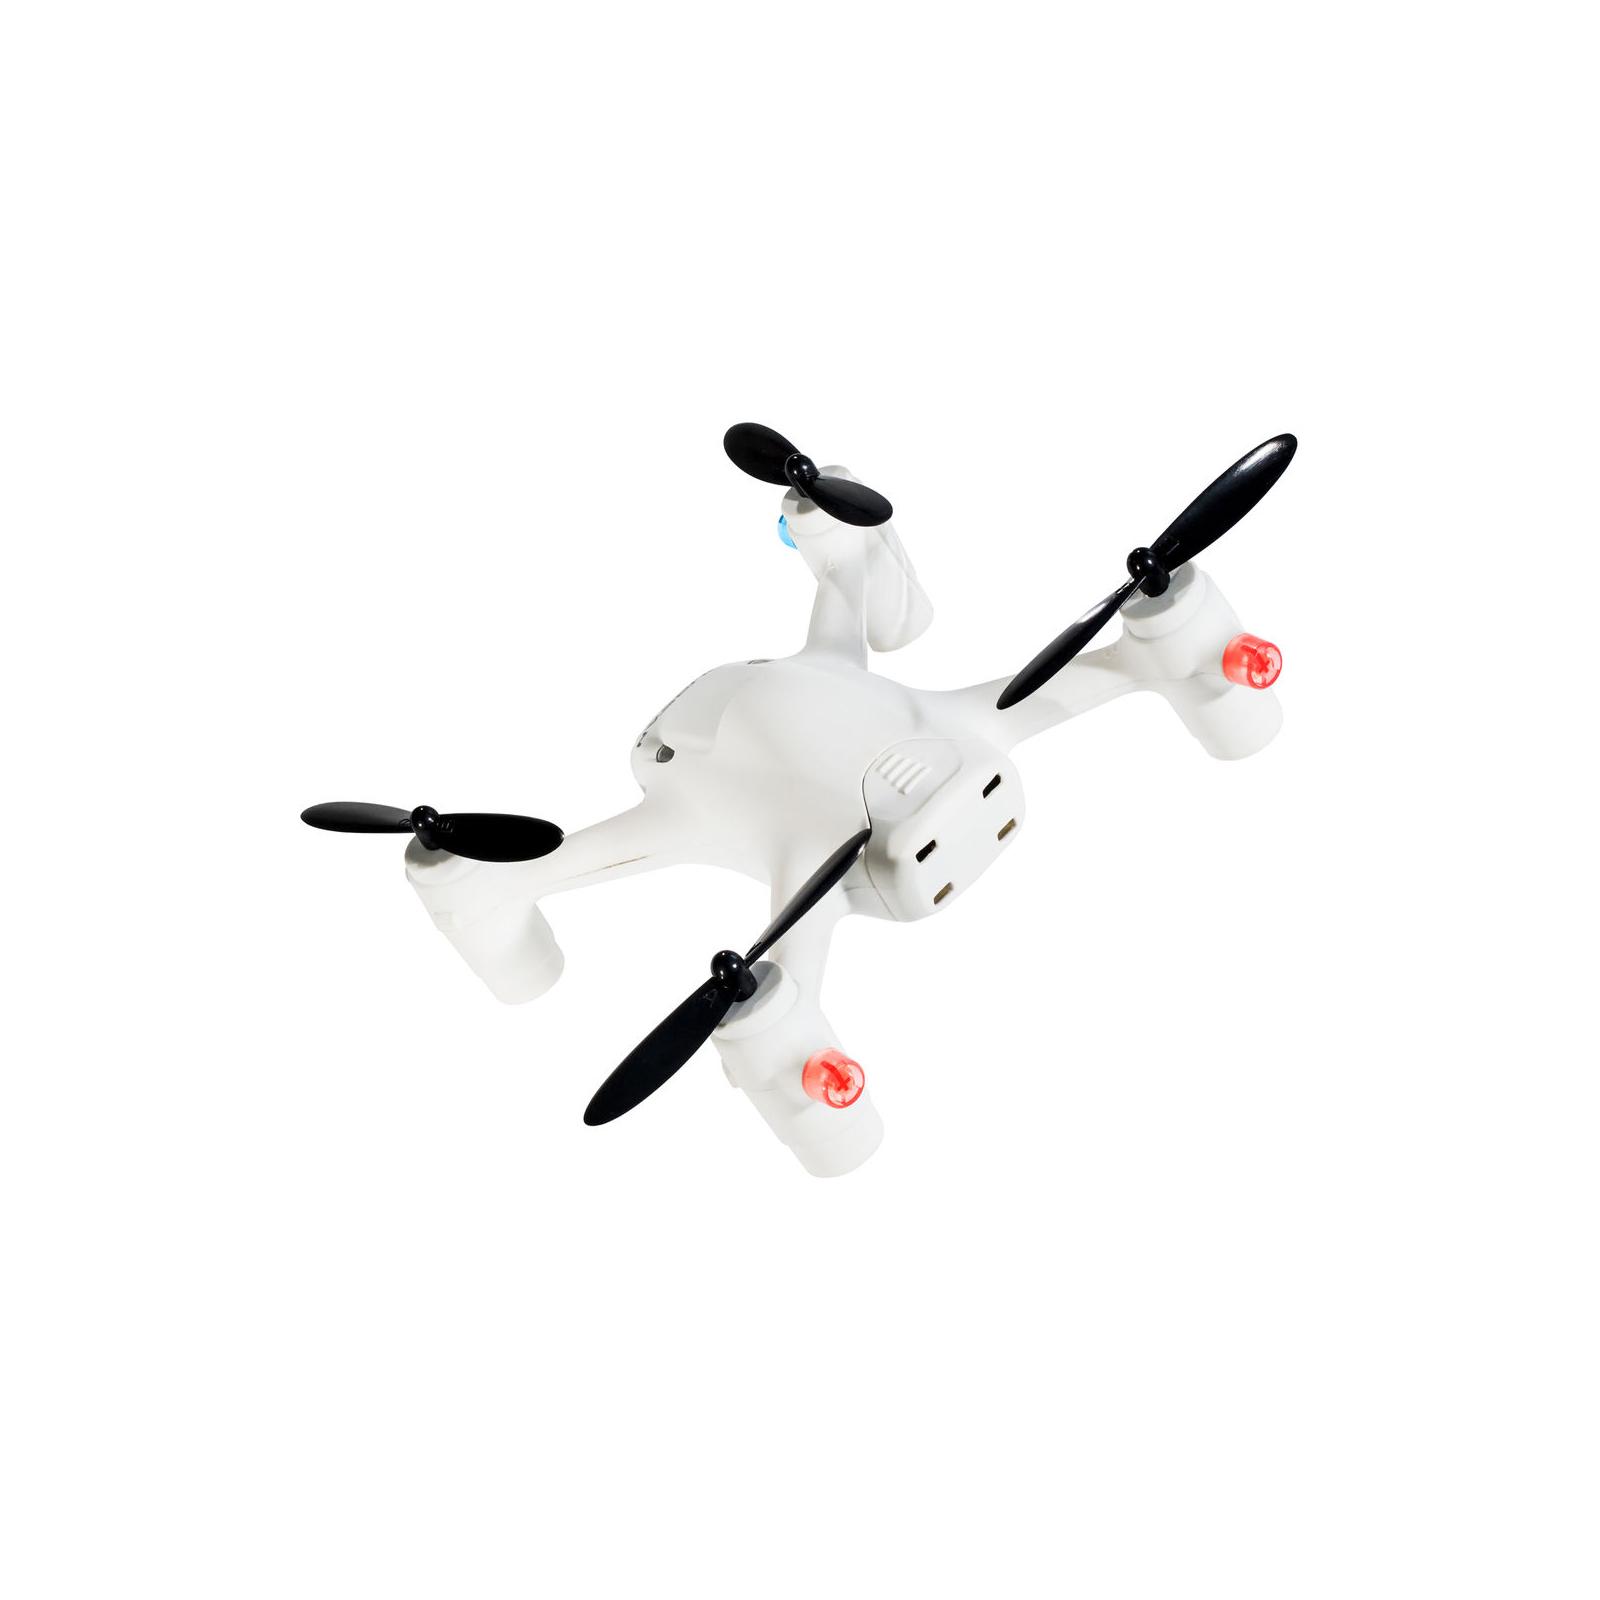 Квадрокоптер Hubsan H107C+ X4 2.4ГГц 4CH RC белый (H107C+ White HD Camera) изображение 8